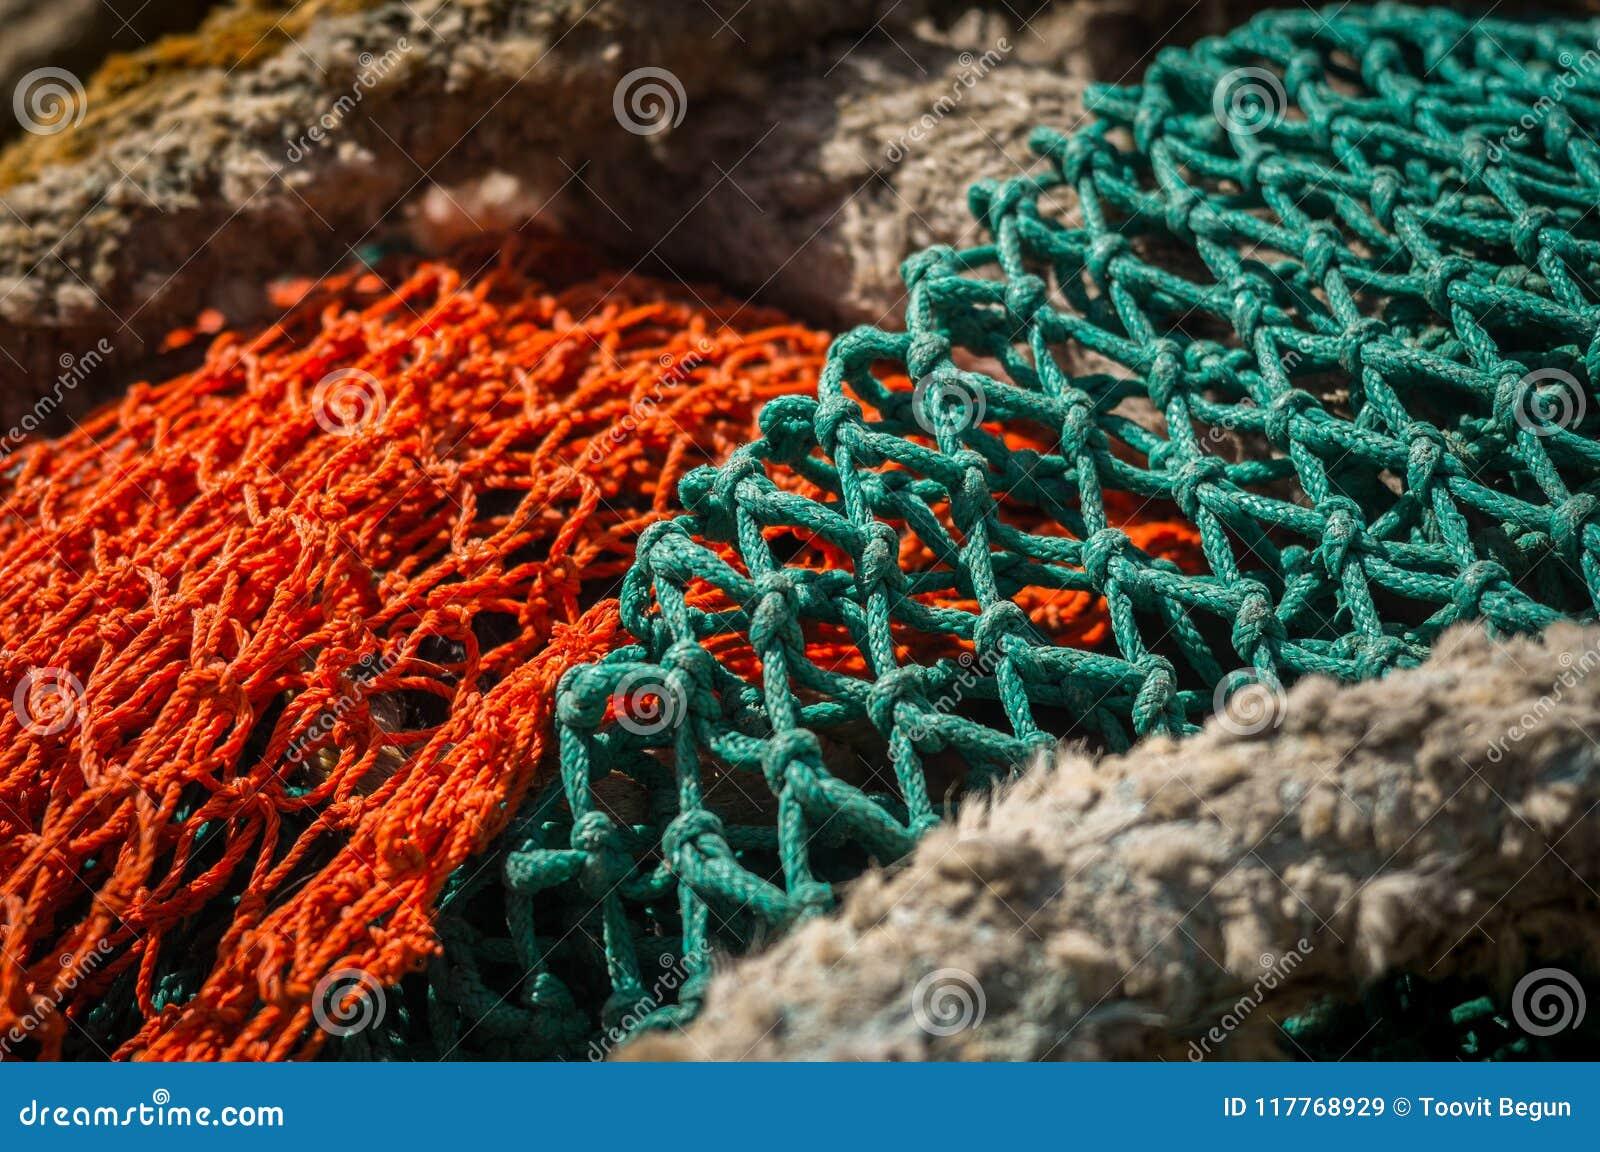 Closeup Of Colorful Fish Net Stock Image - Image of fishing, harbor ...